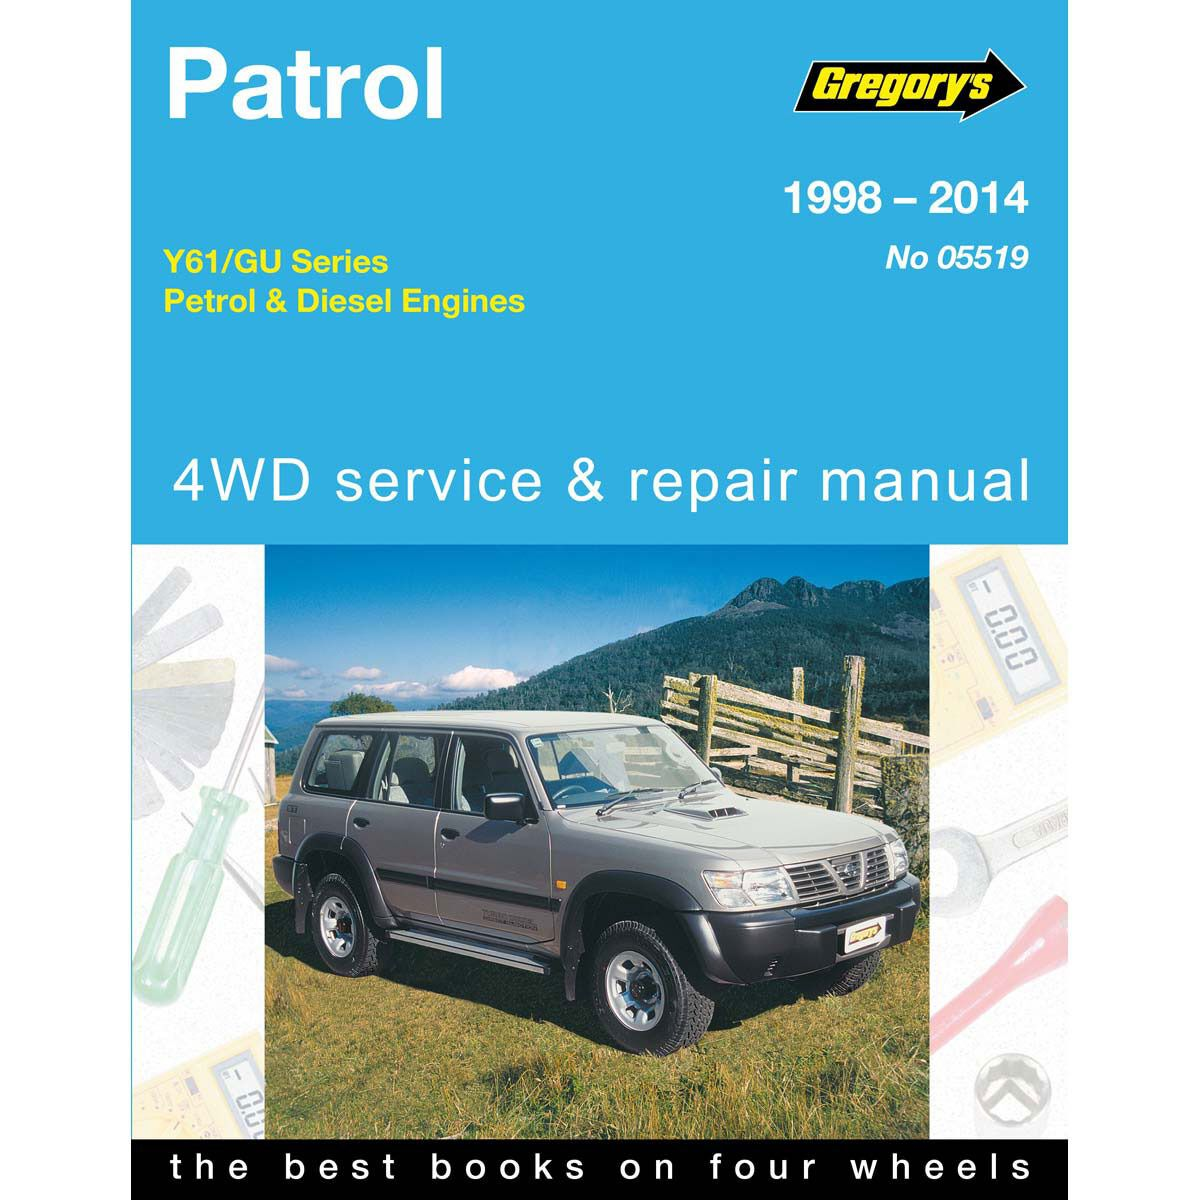 gregory s car manual for nissan patrol 1998 2014 519 supercheap auto rh supercheapauto com au